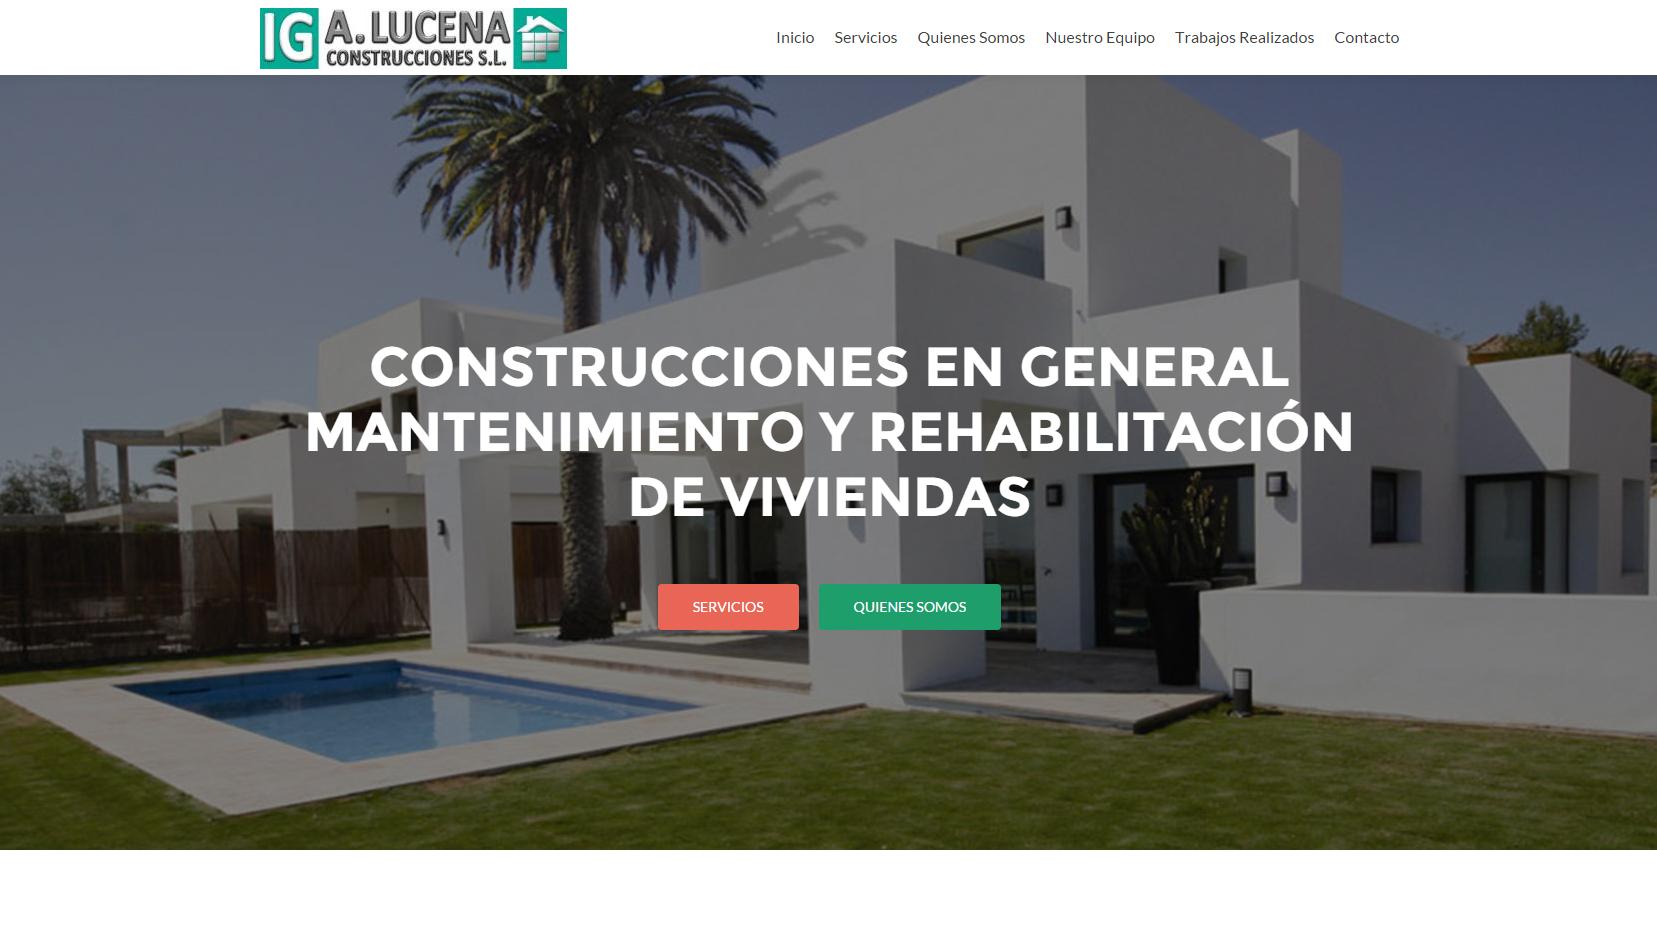 Web-IGLucena-1 WEB Desing